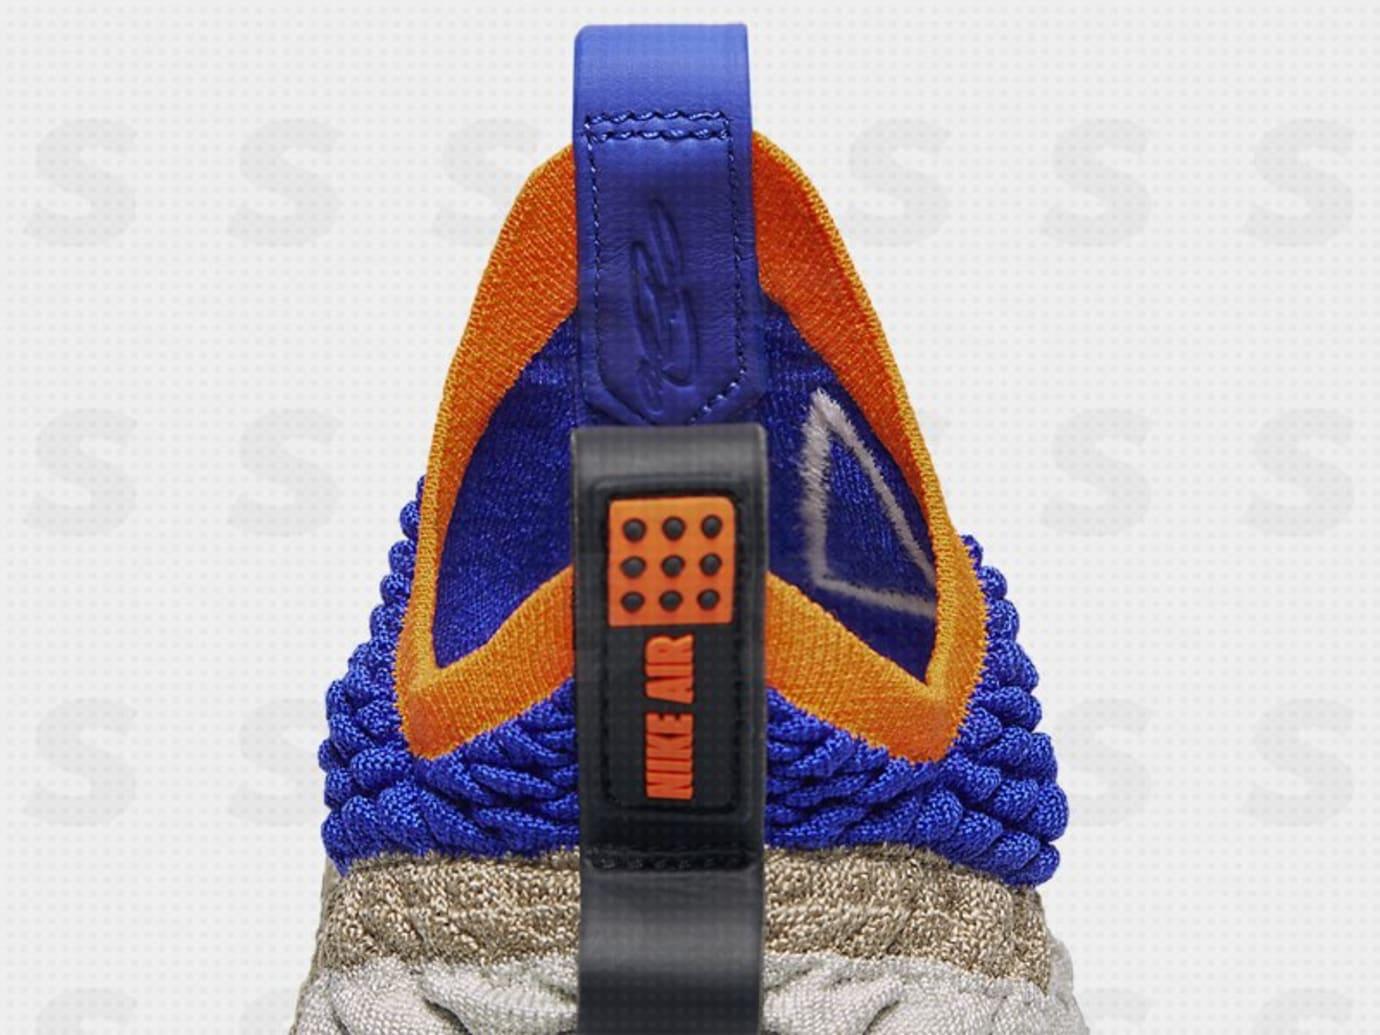 wholesale dealer ac9d7 b1fae Image via sinshouhin on Twitter Nike LeBron 15 Mowab LeBron Watch